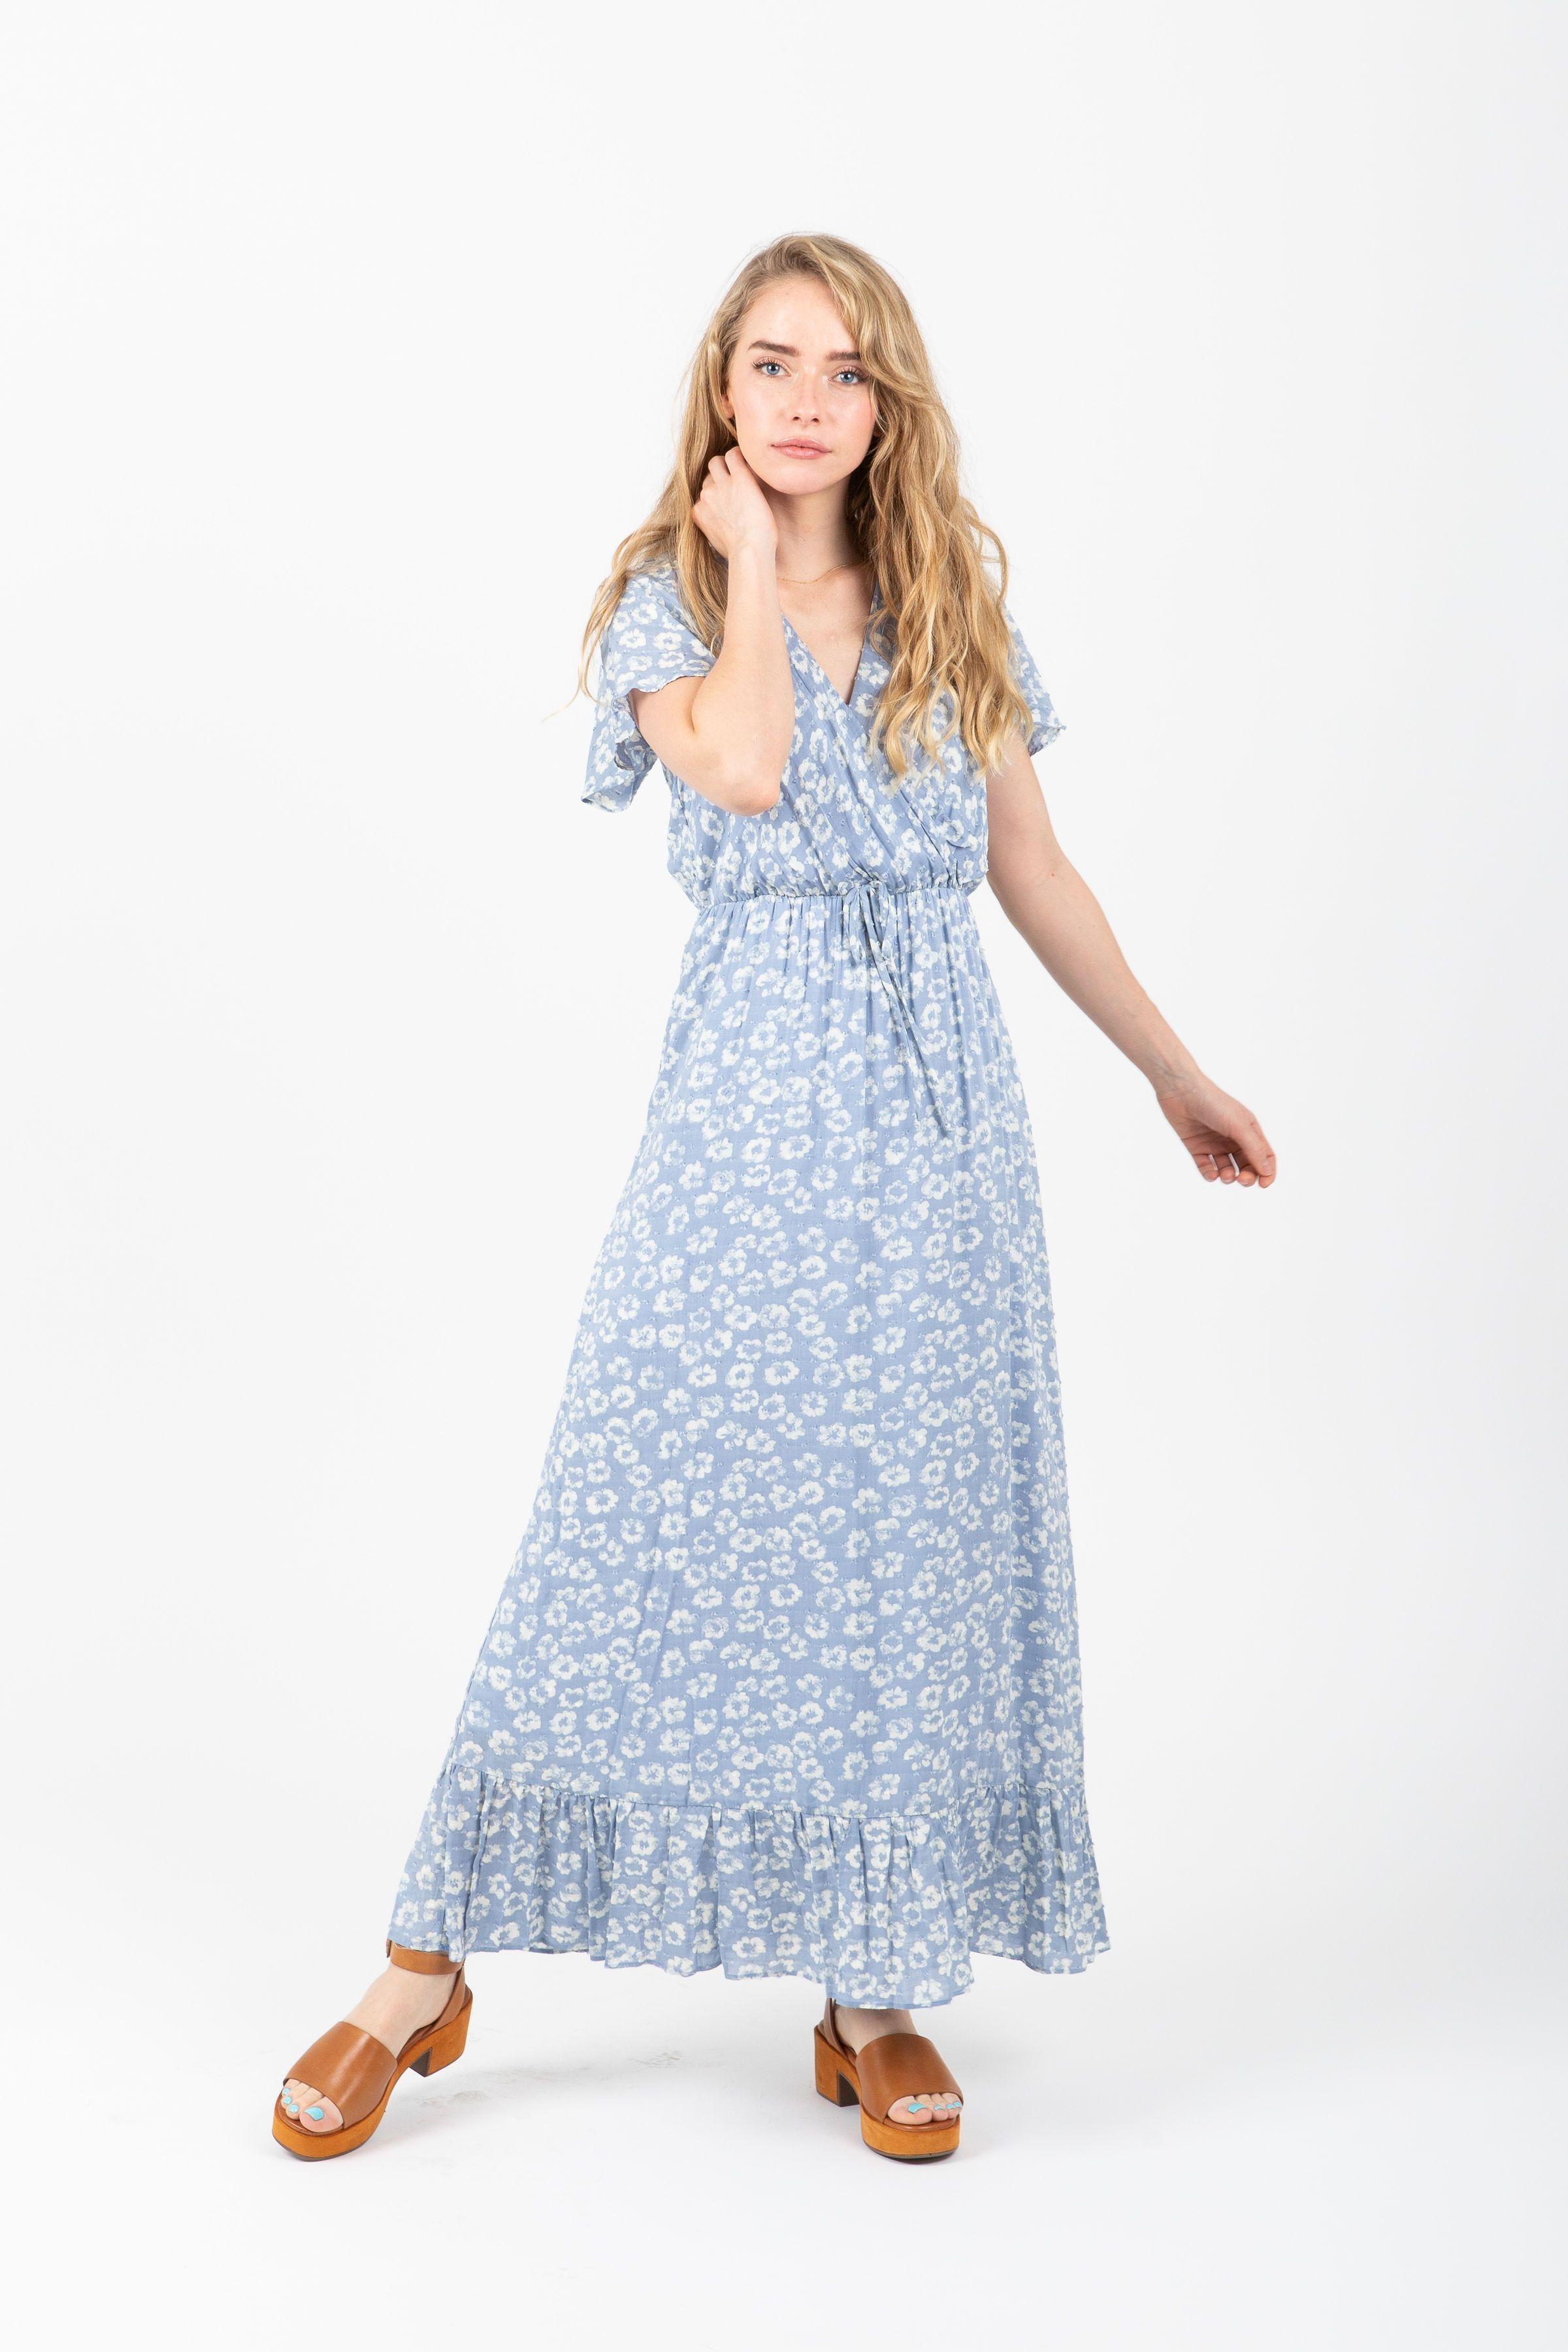 ef9b0f97a77f The Soar Floral Ruffle Maxi Dress in Blue – Piper & Scoot